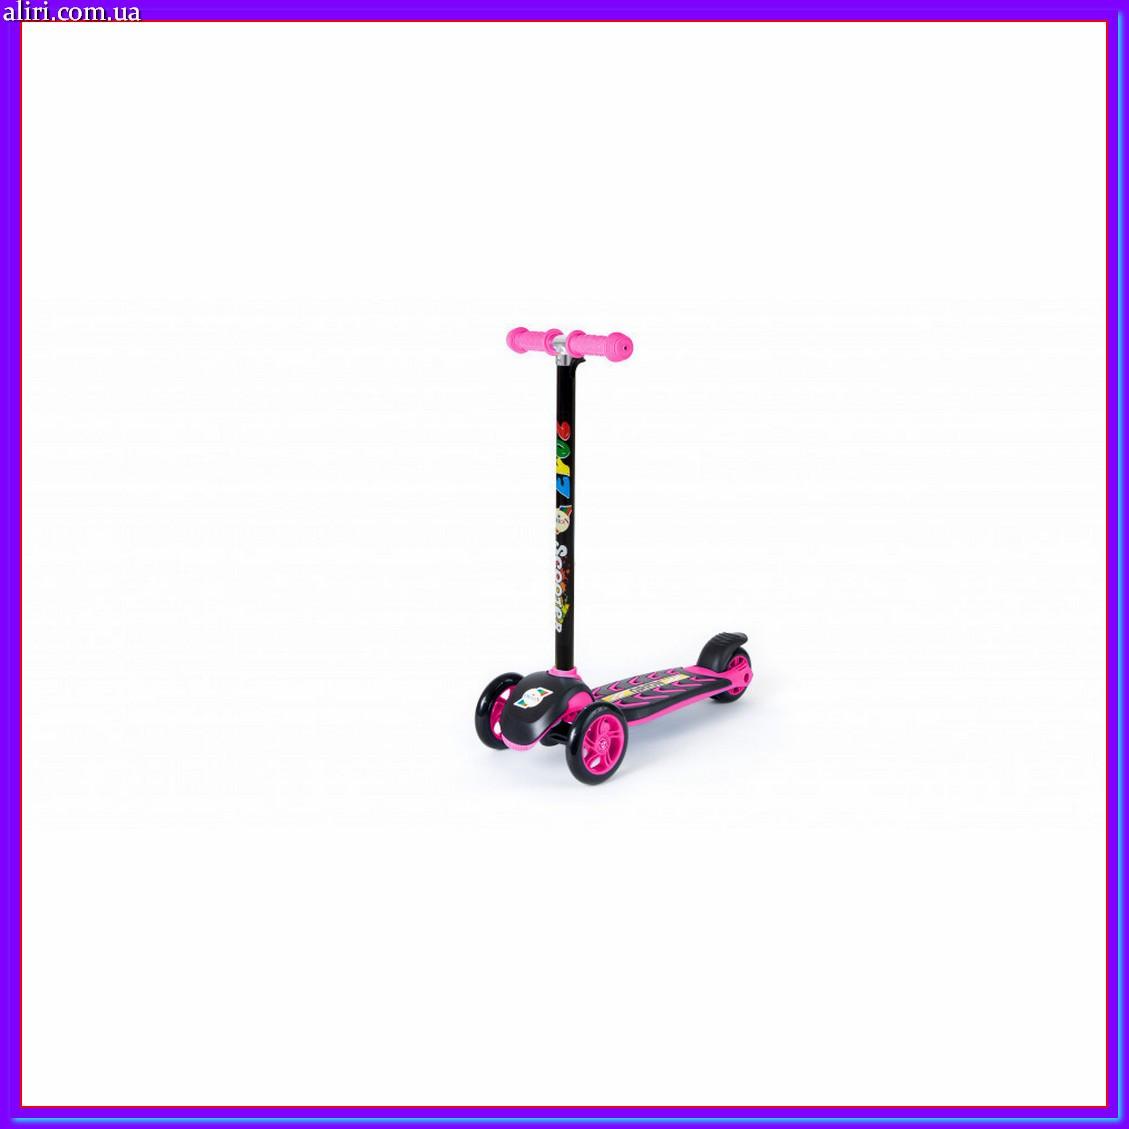 Самокат ORION 00164 розовый до 40 кг